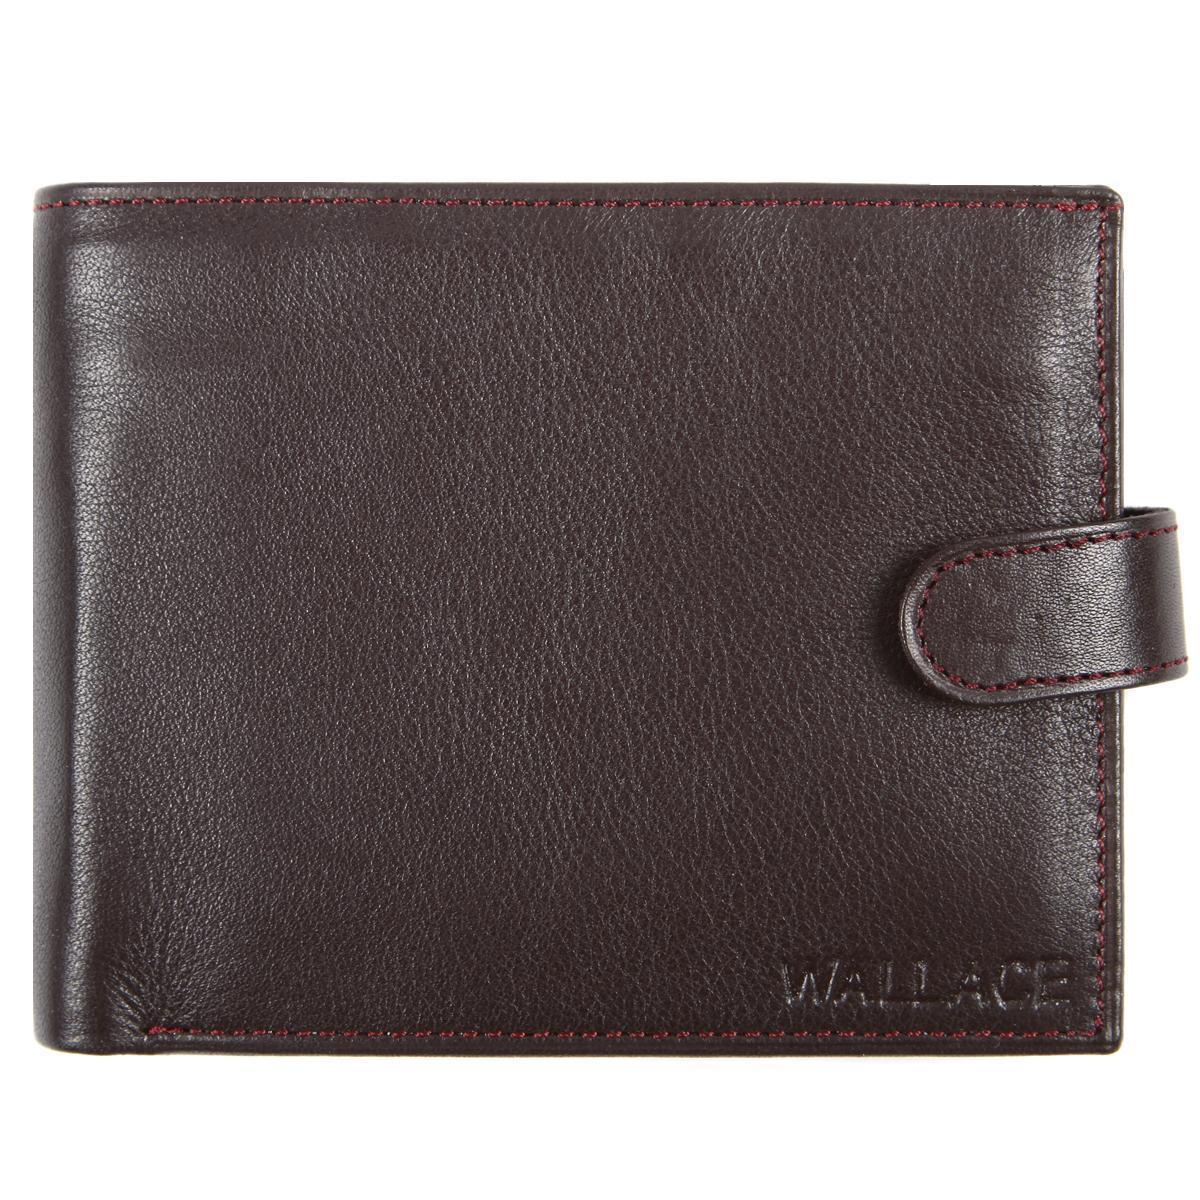 Мужское портмоне кожаное WALLACE 120х95х20 тр401кор